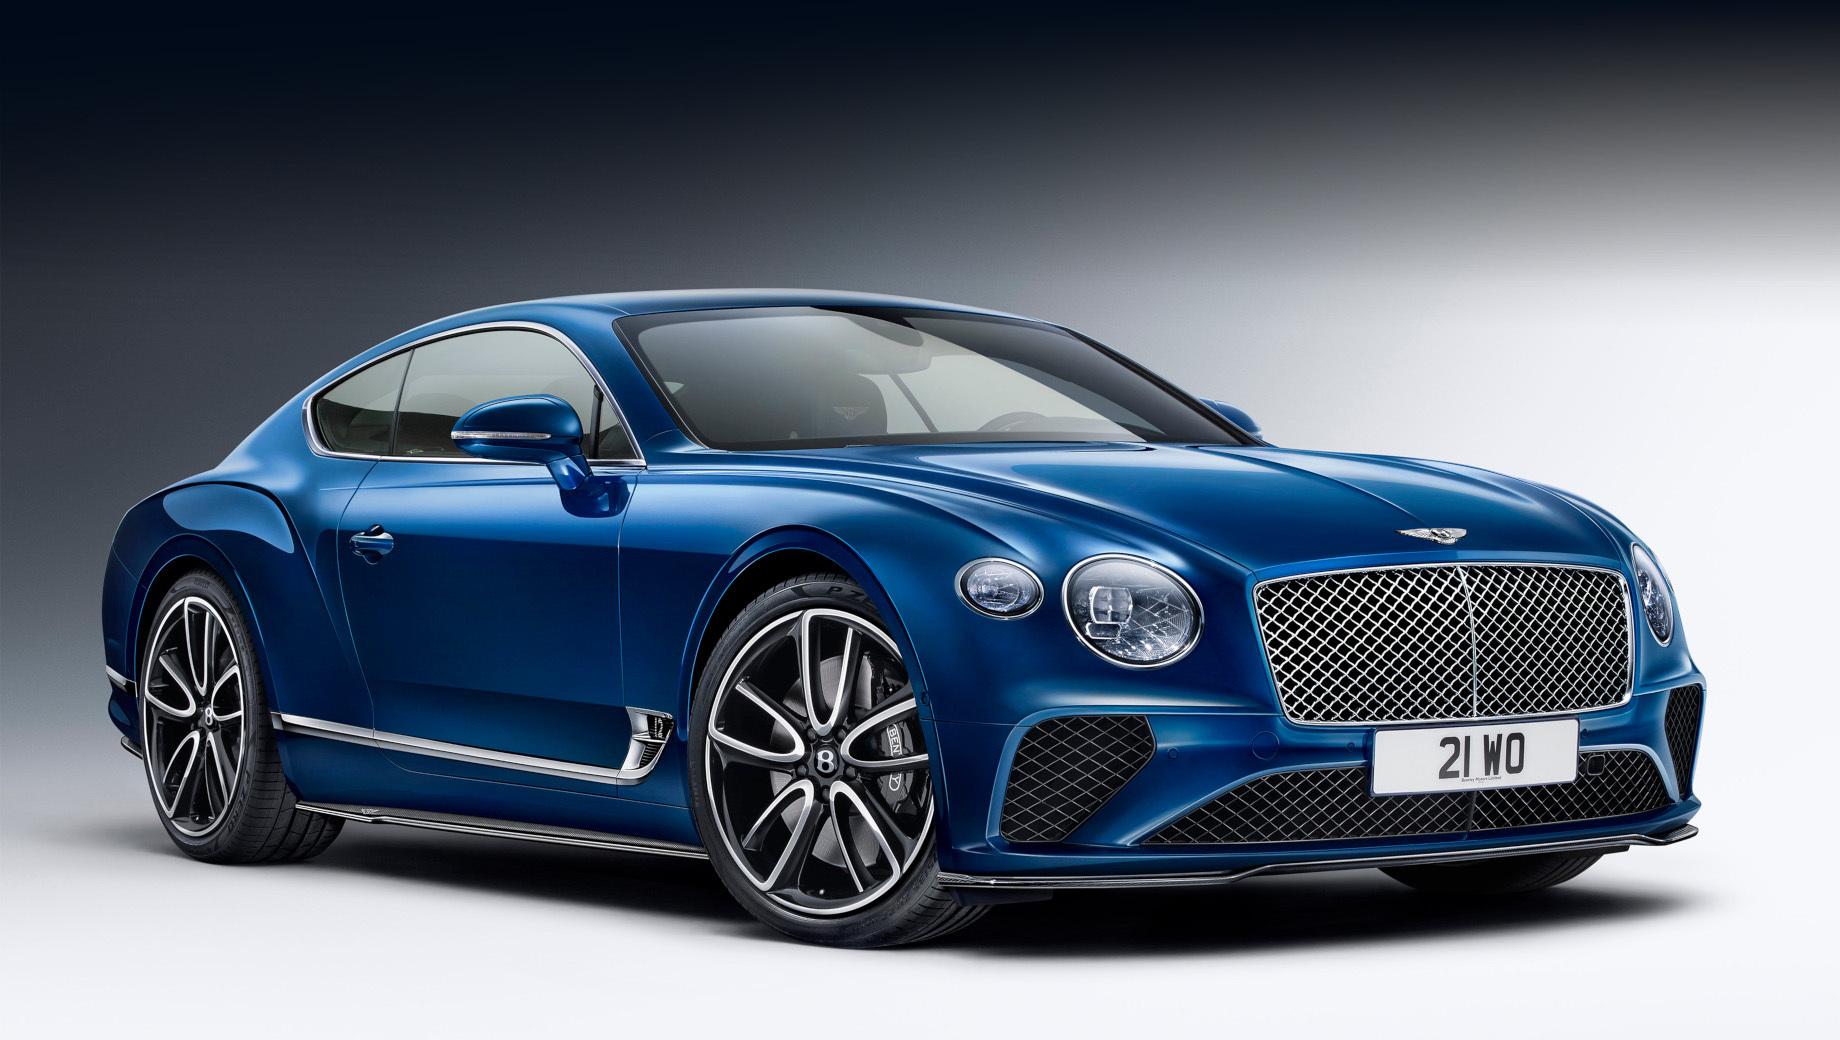 Пакет Bentley Styling объединил дизайн и аэродинамику